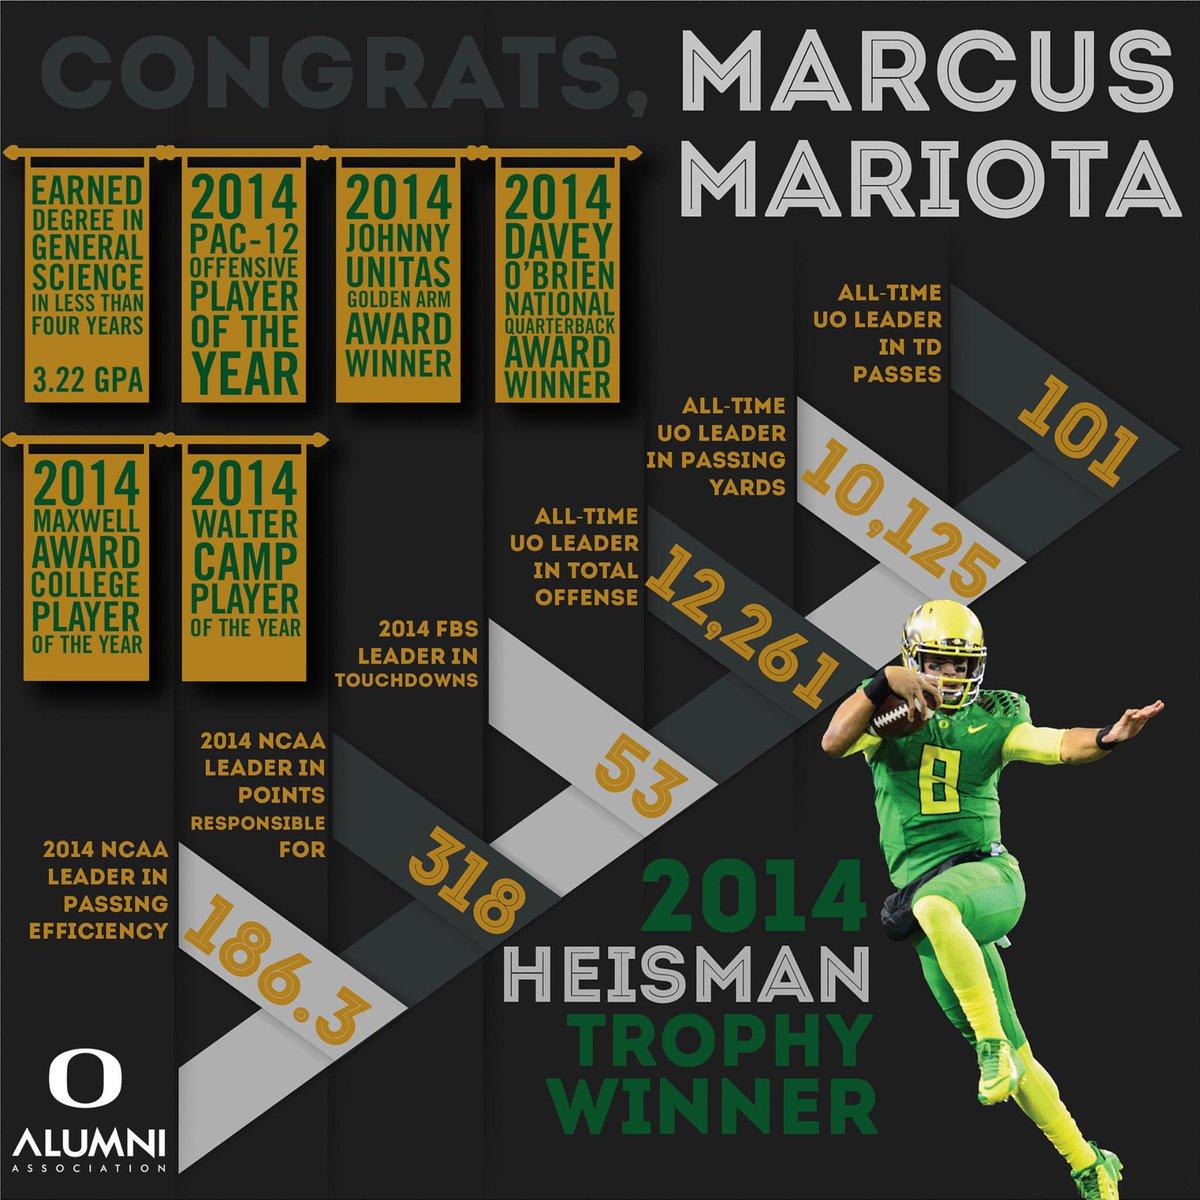 Marcus Mariota: 2014 Heisman Trophy winner. Oregon Duck. #MahaloMarcus #HeismanMariota #GoDucks http://t.co/T6eRc5b1n8